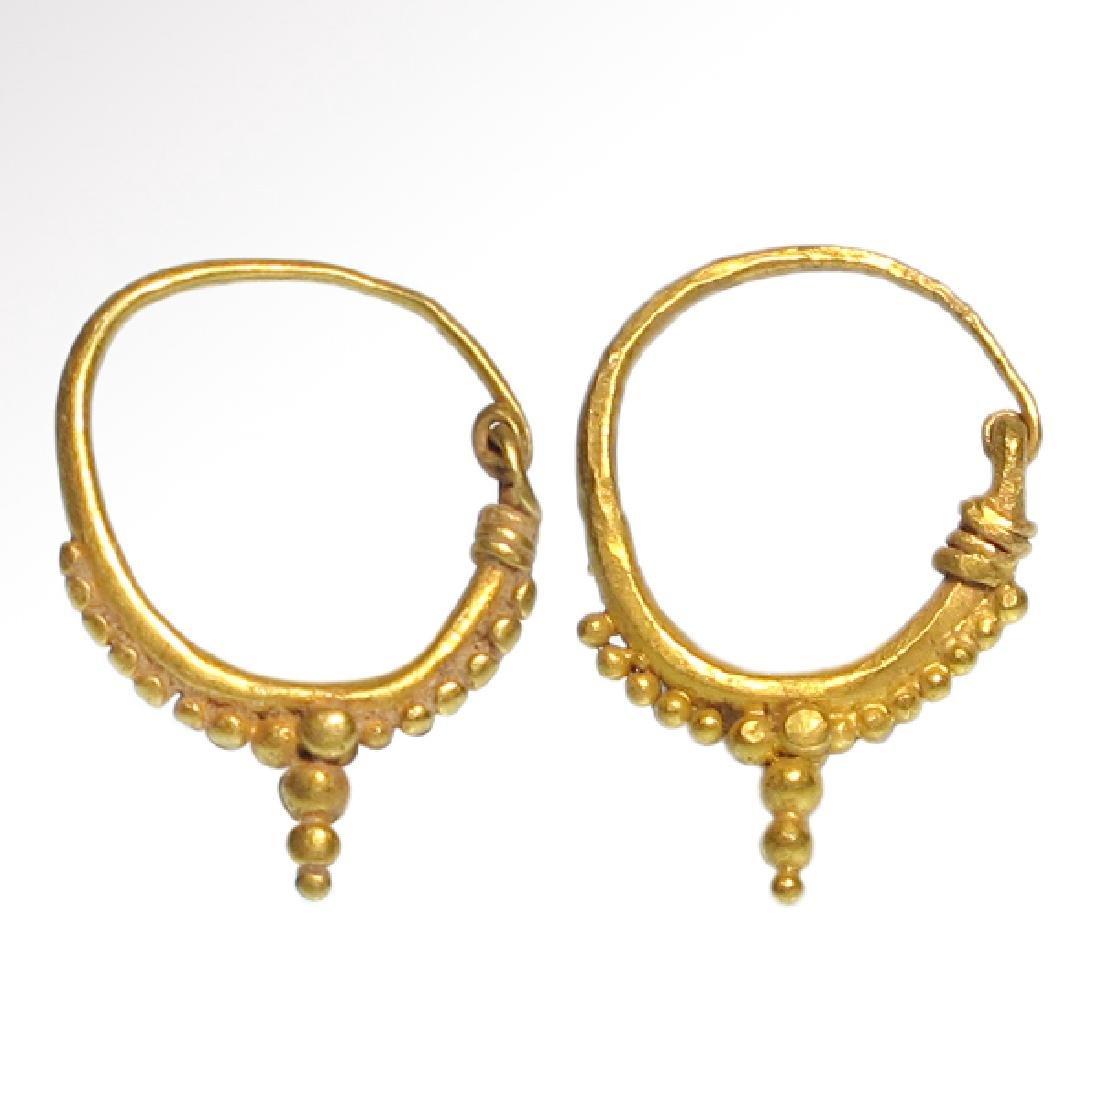 Roman Gold Hoop Earrings, c. 2nd-4th Century A.D.